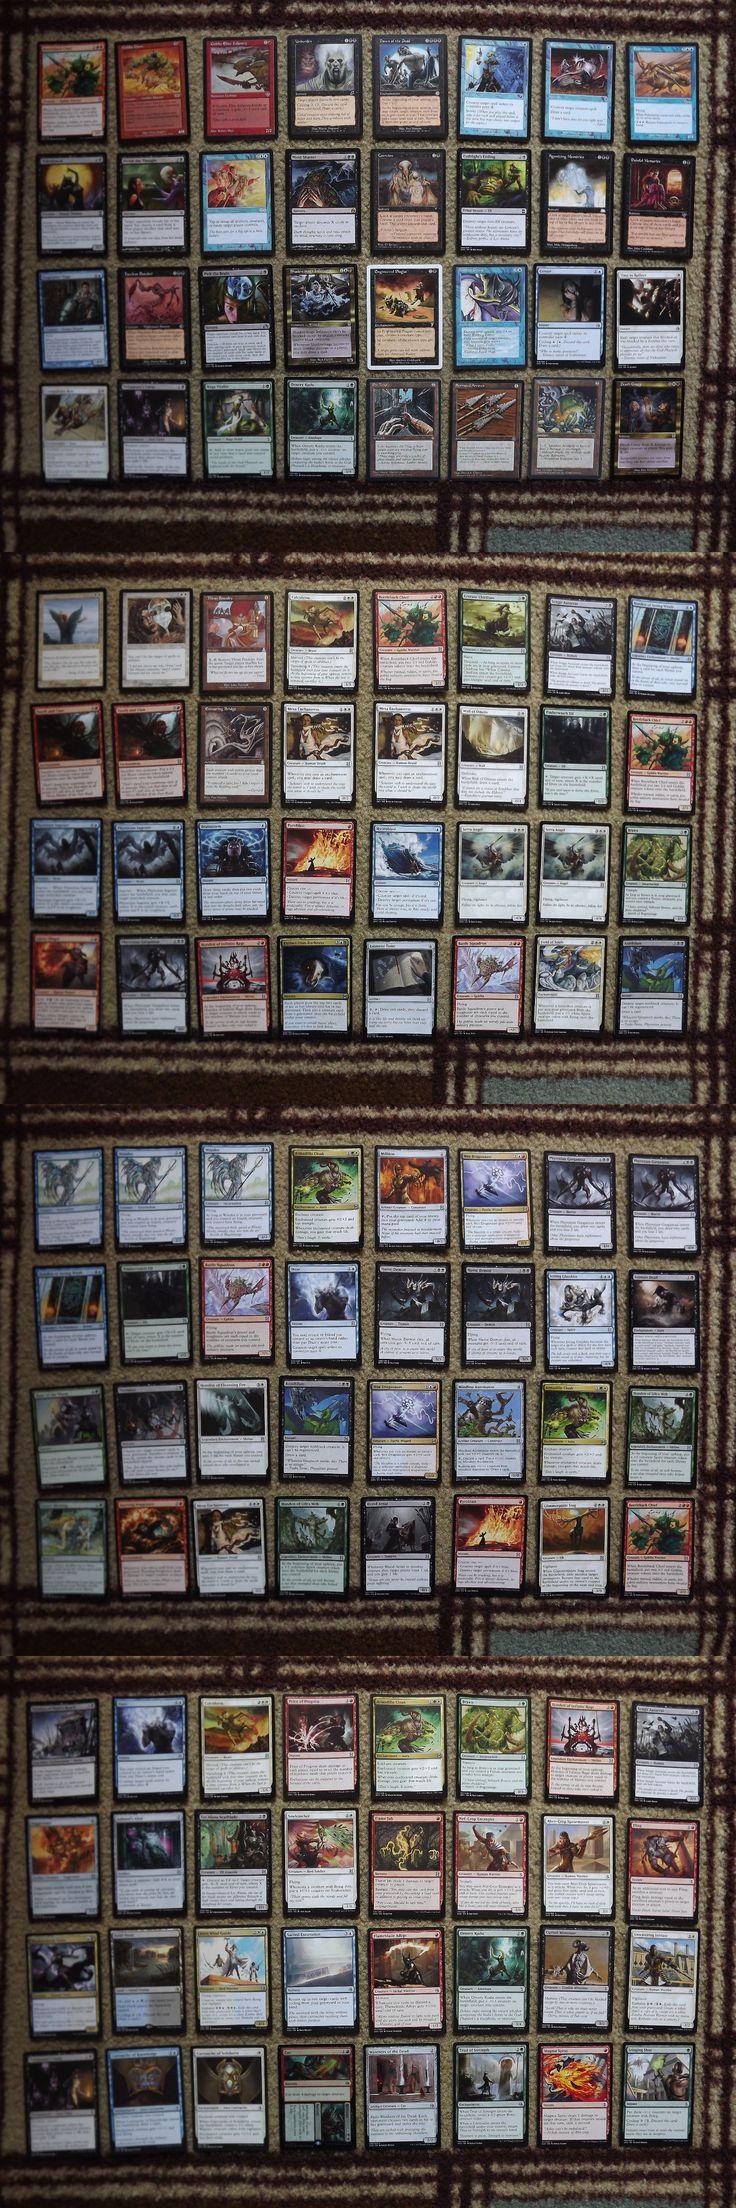 MTG Mixed Card Lots 19113: Mtg Lot Snapcaster Mage + Ensnaring Bridge Humility Adarkar Wastes Living Death -> BUY IT NOW ONLY: $120 on eBay!